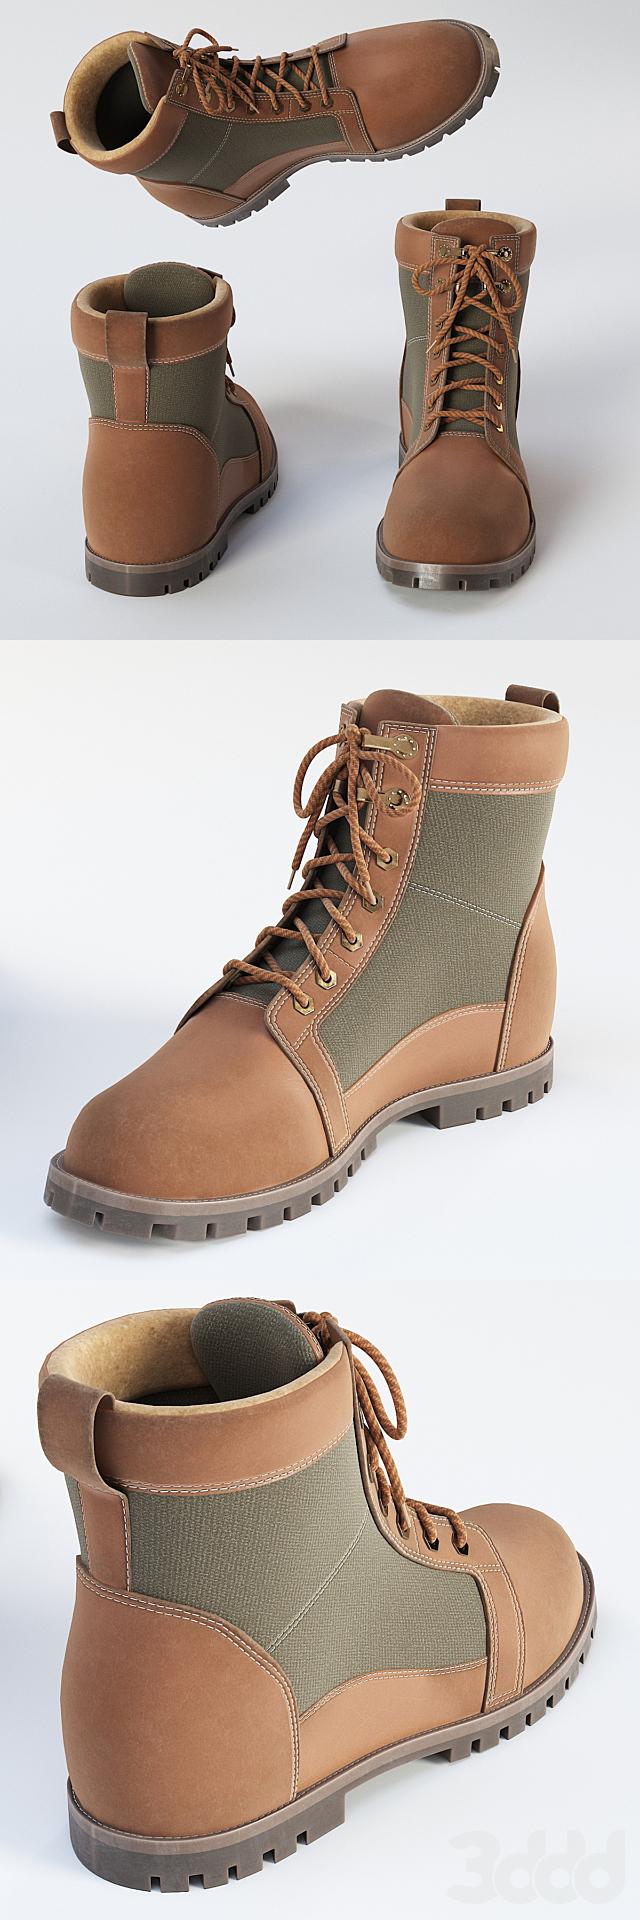 Kodiak Thane Boots